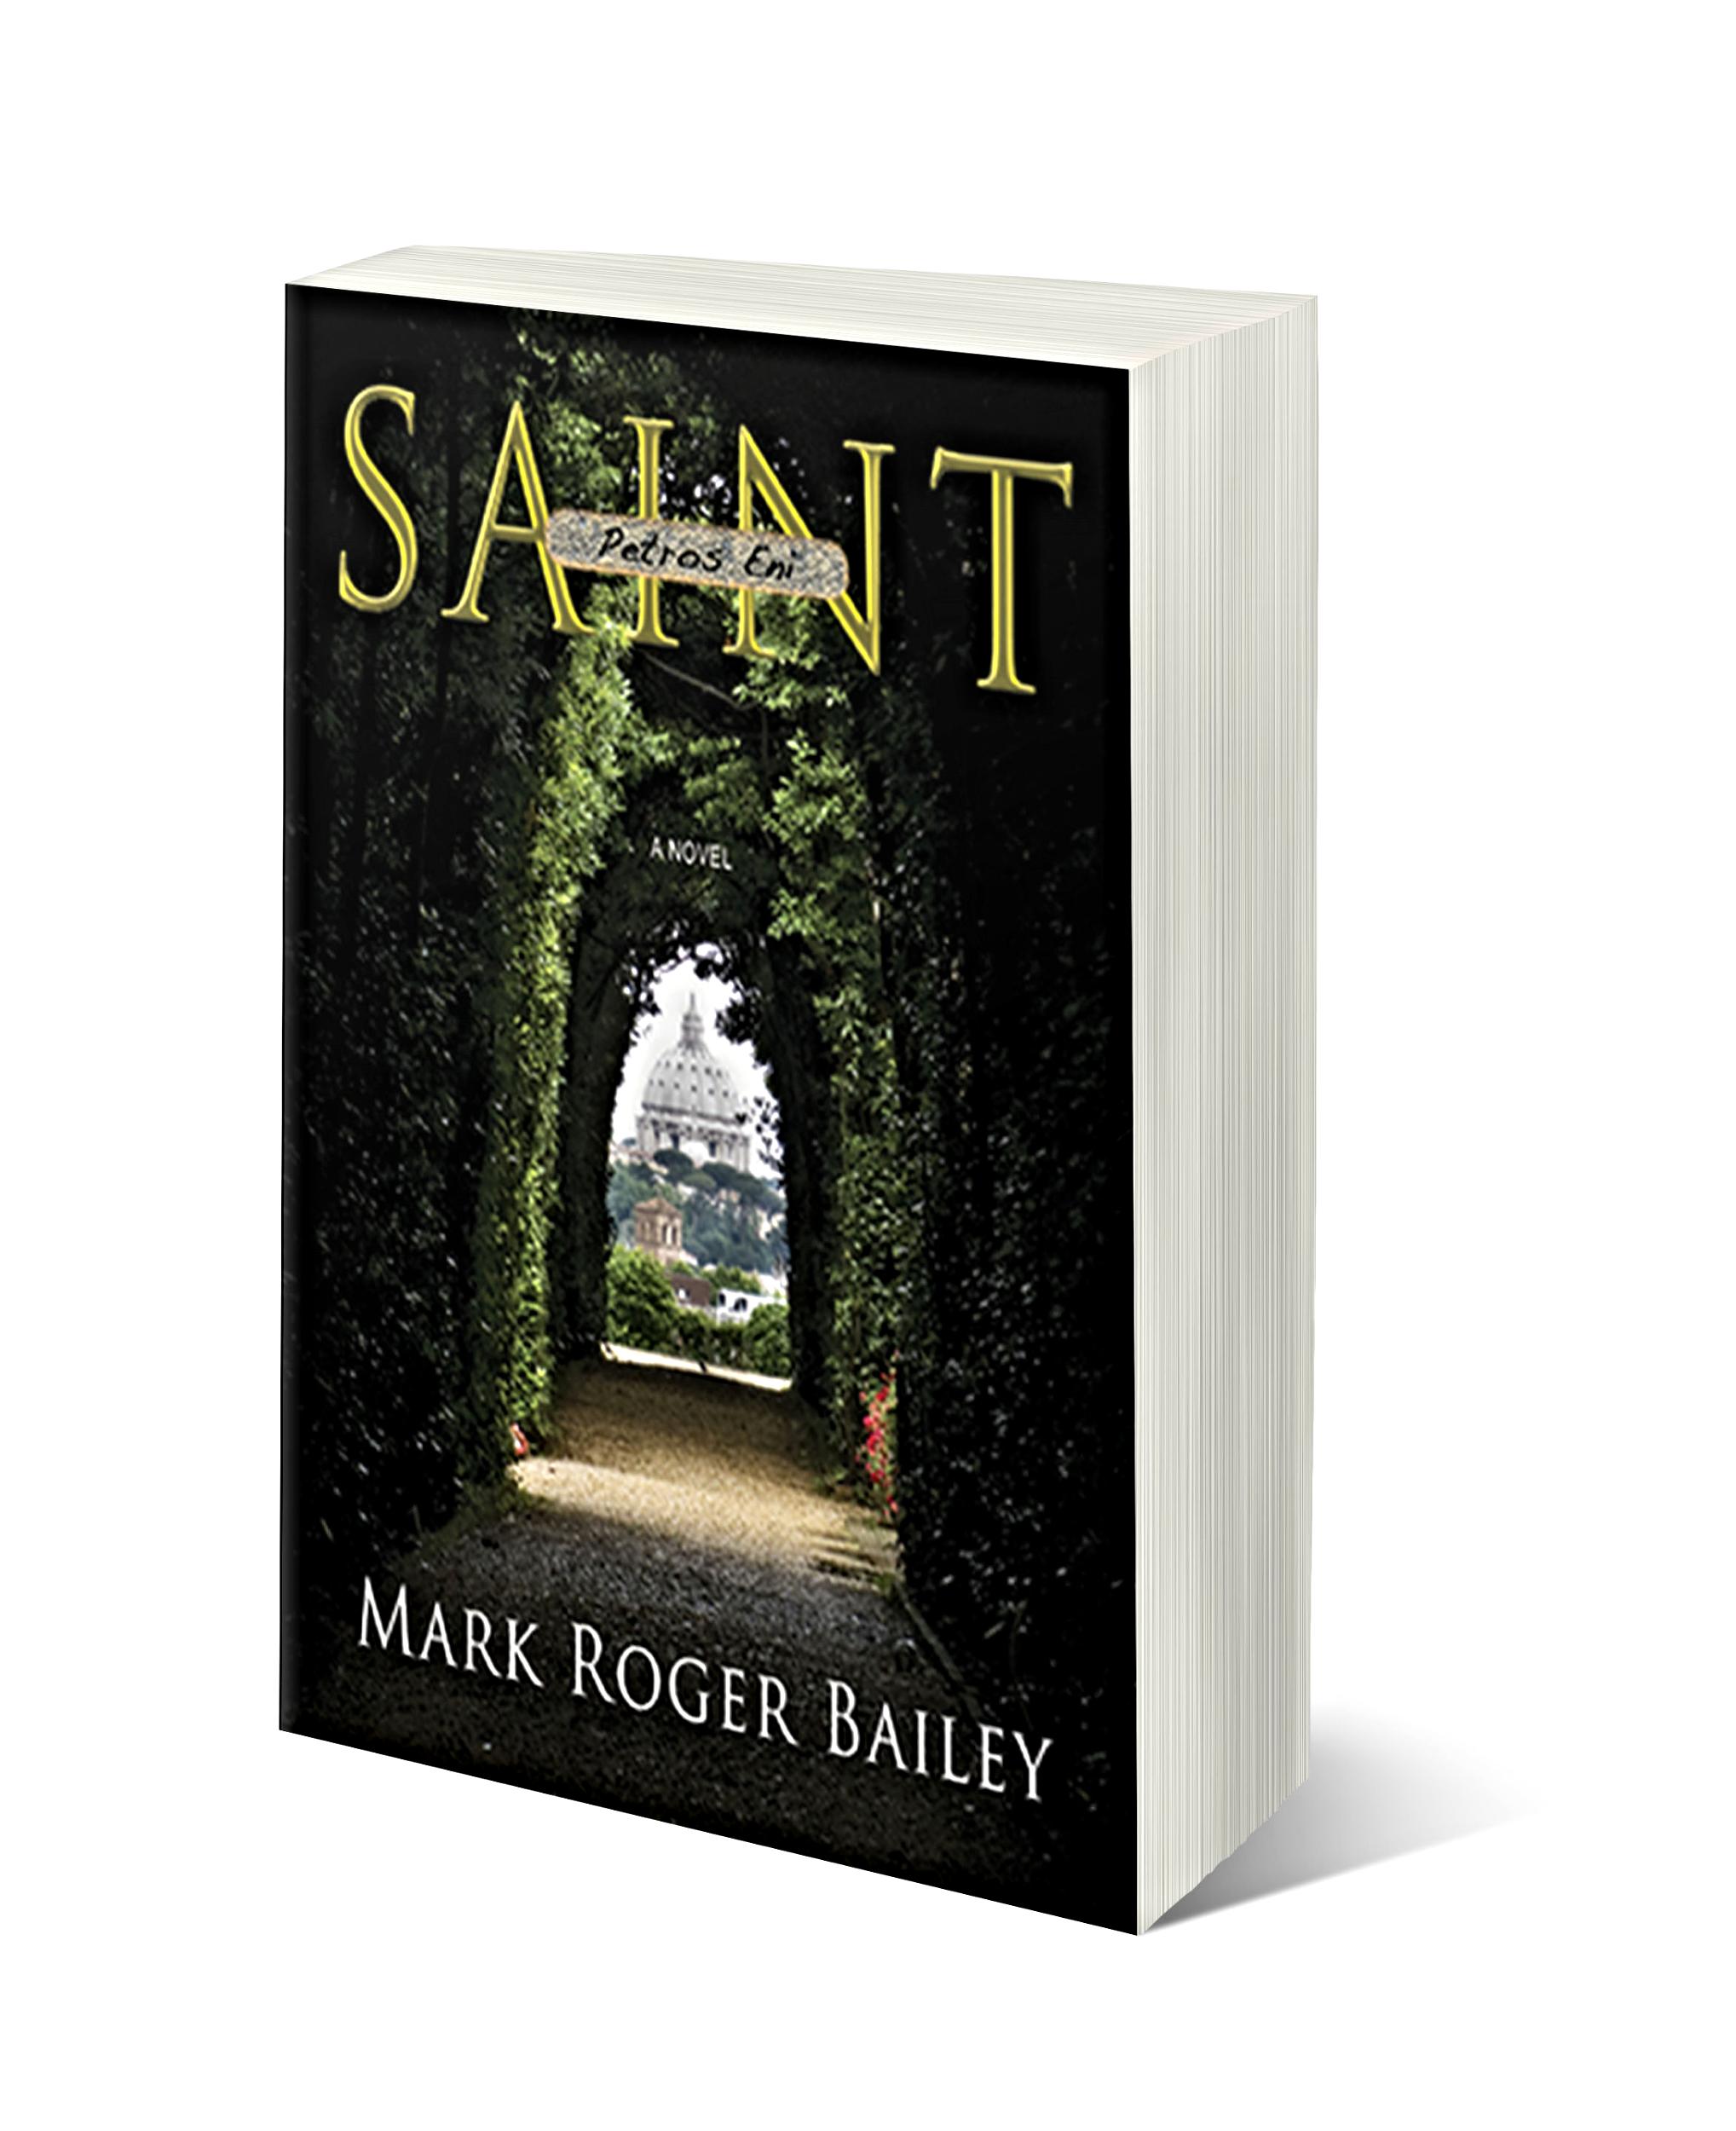 SAINT - The timeless novel